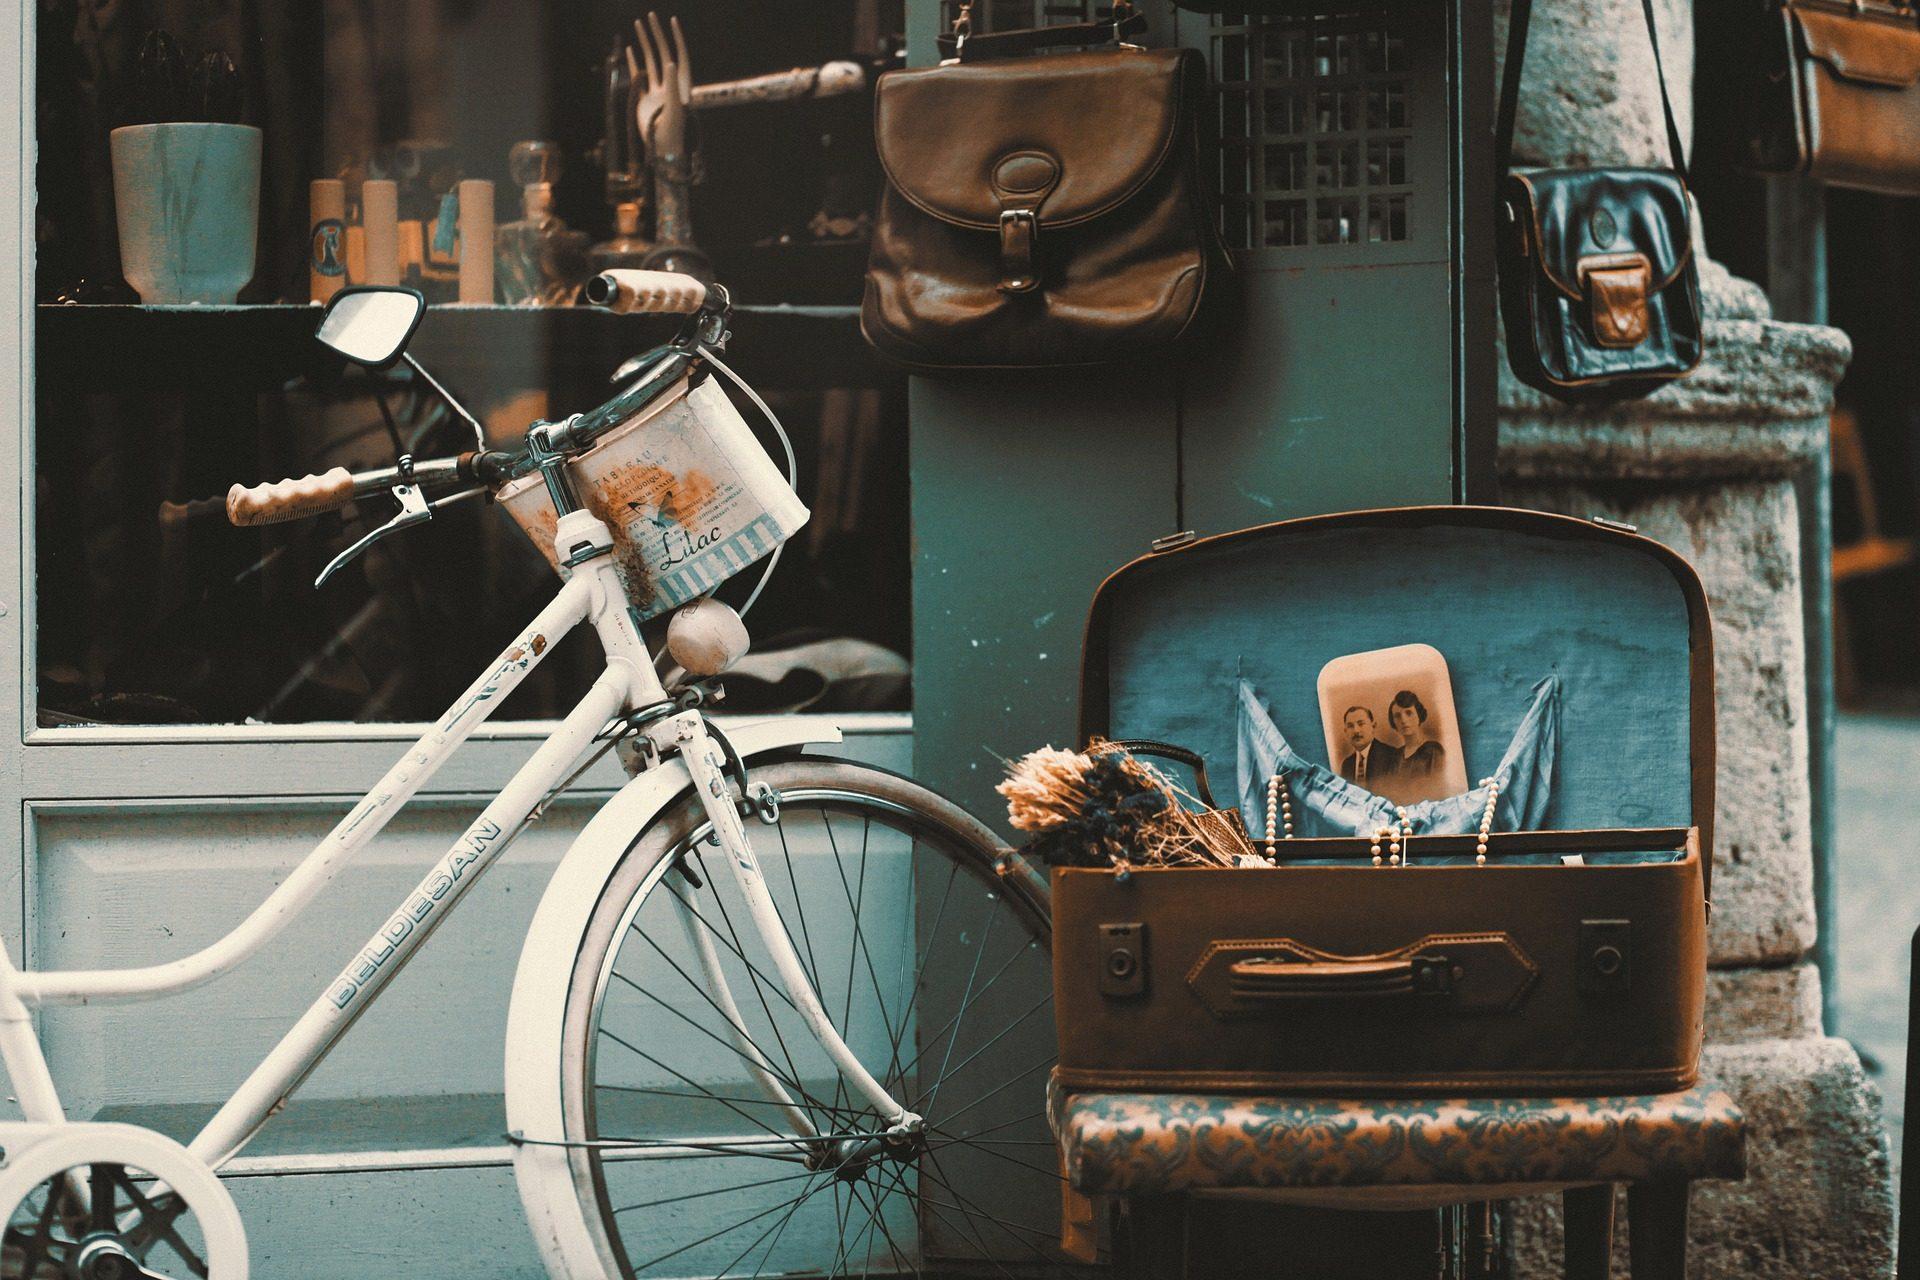 bicicleta, mala, Loja, bolso, vintage, retrô, Istambul - Papéis de parede HD - Professor-falken.com